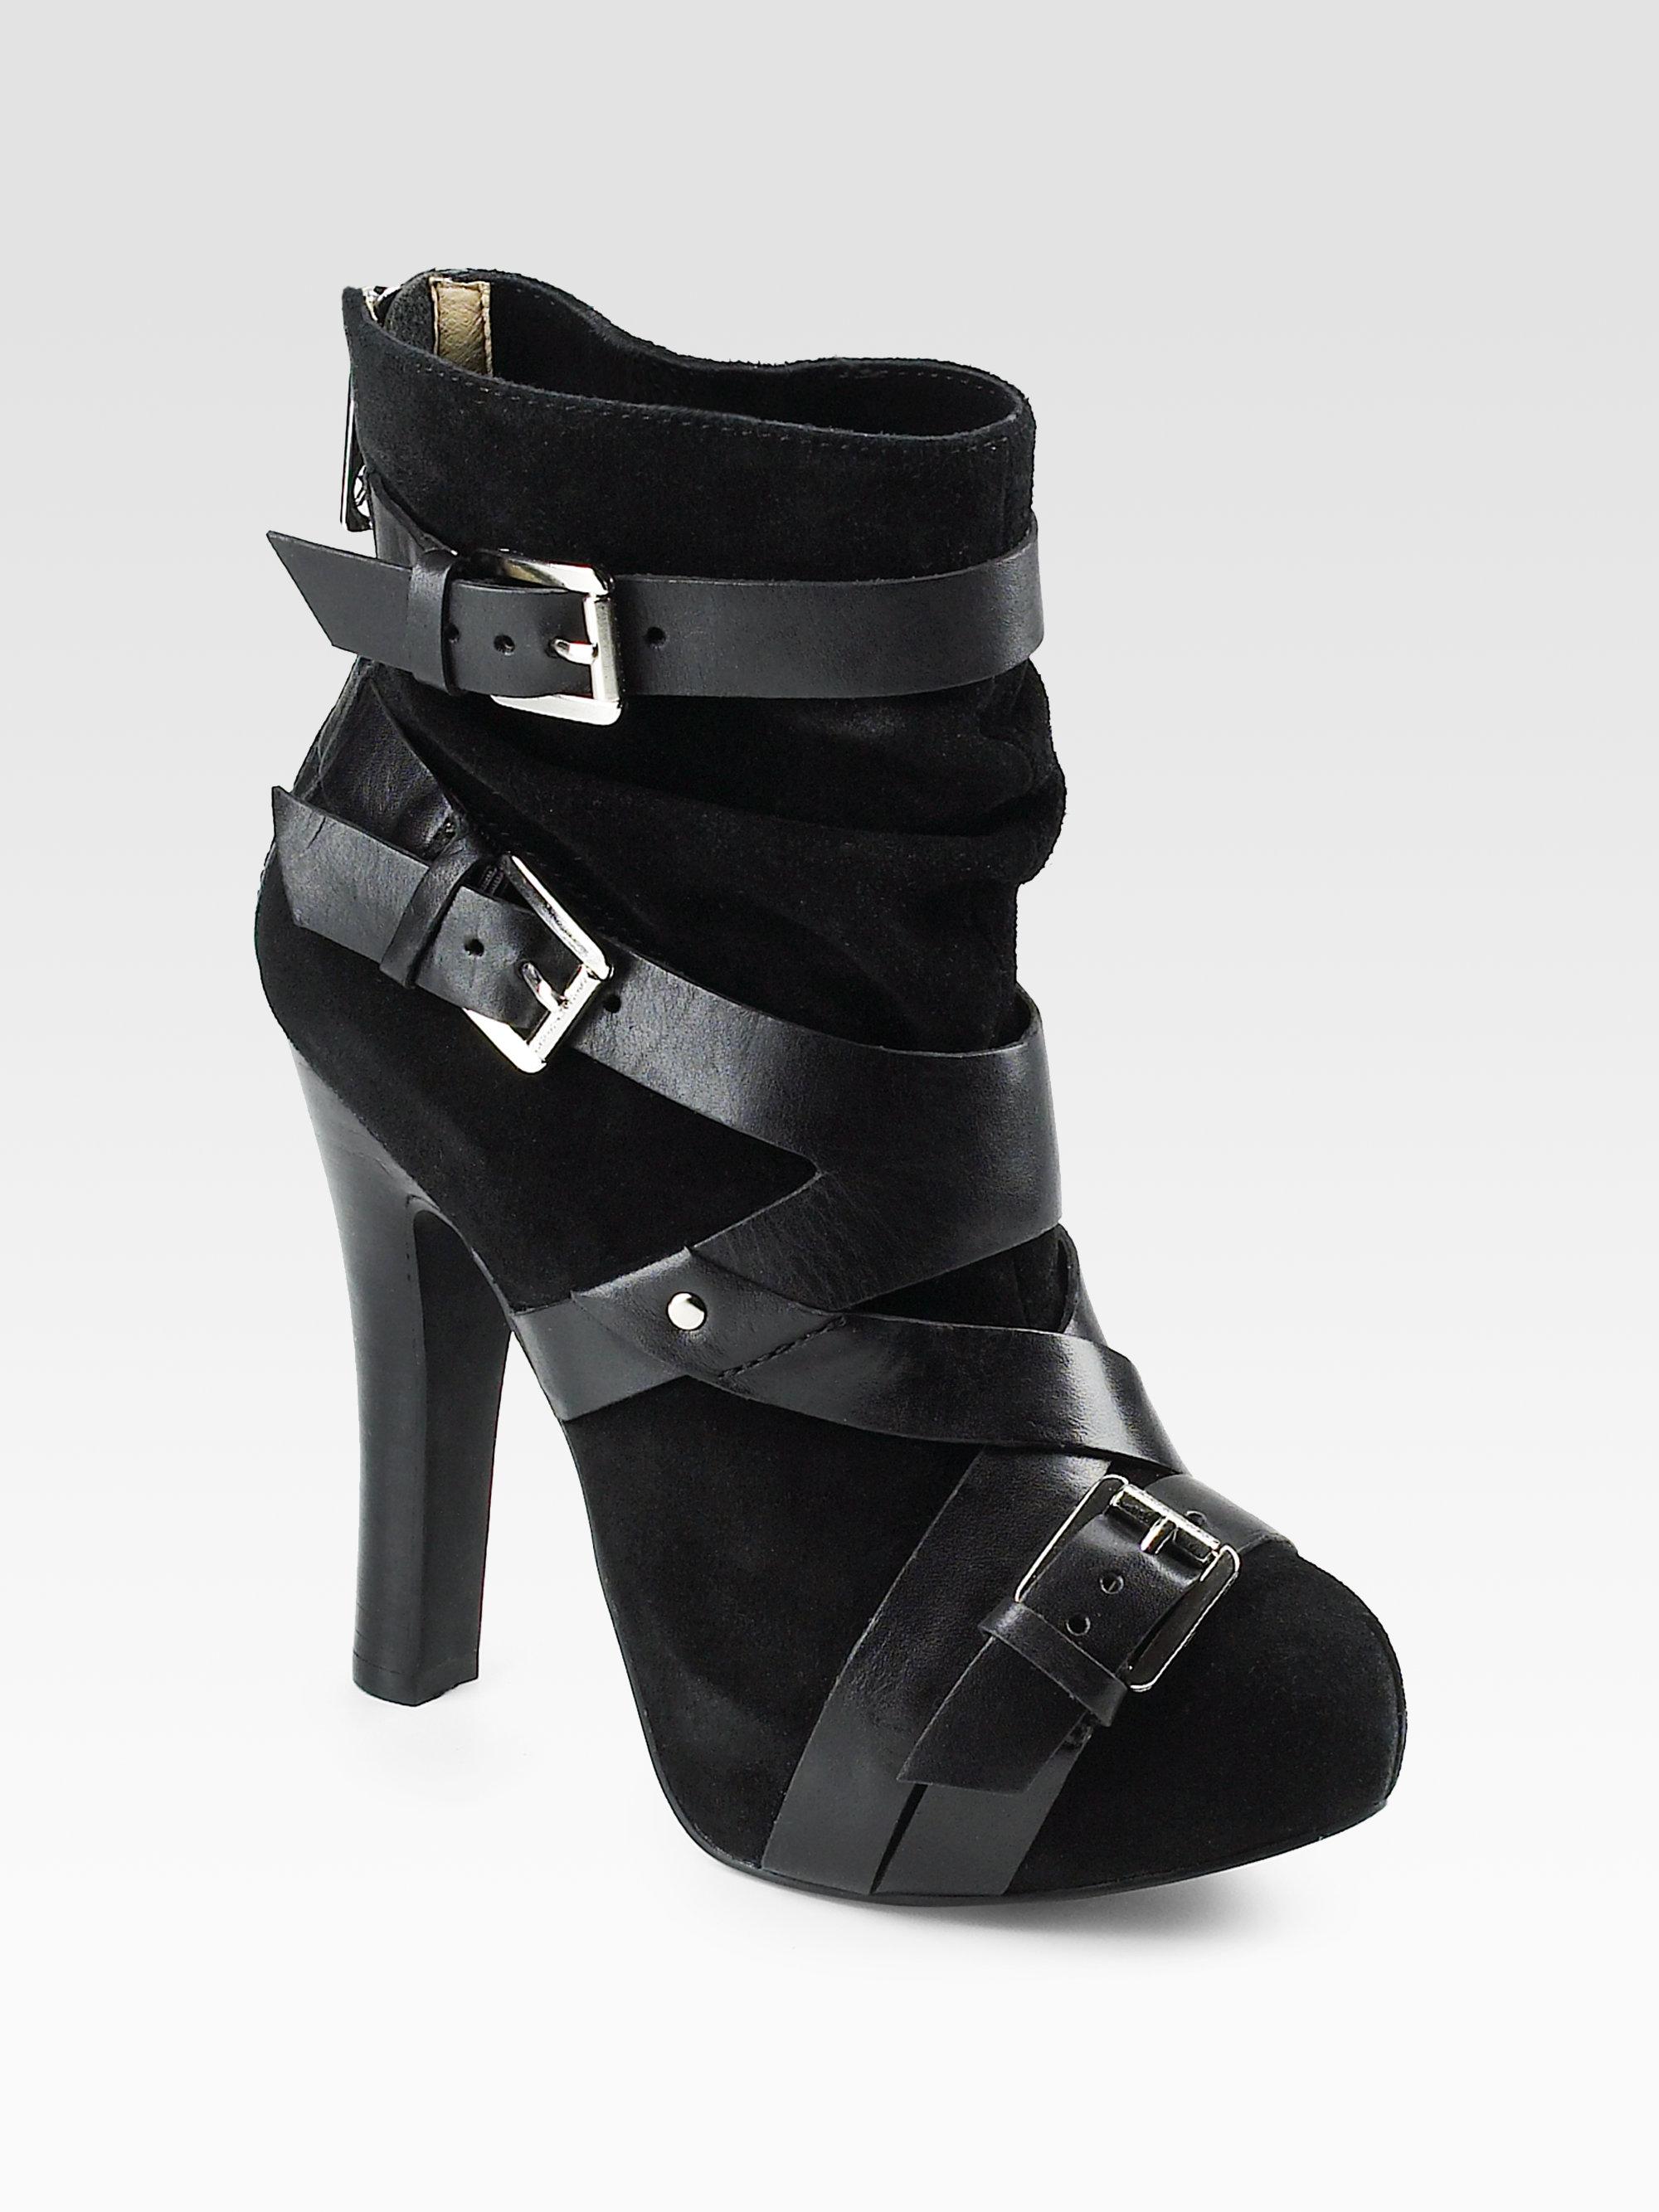 michael michael kors tatum suede ankle boots in black lyst. Black Bedroom Furniture Sets. Home Design Ideas